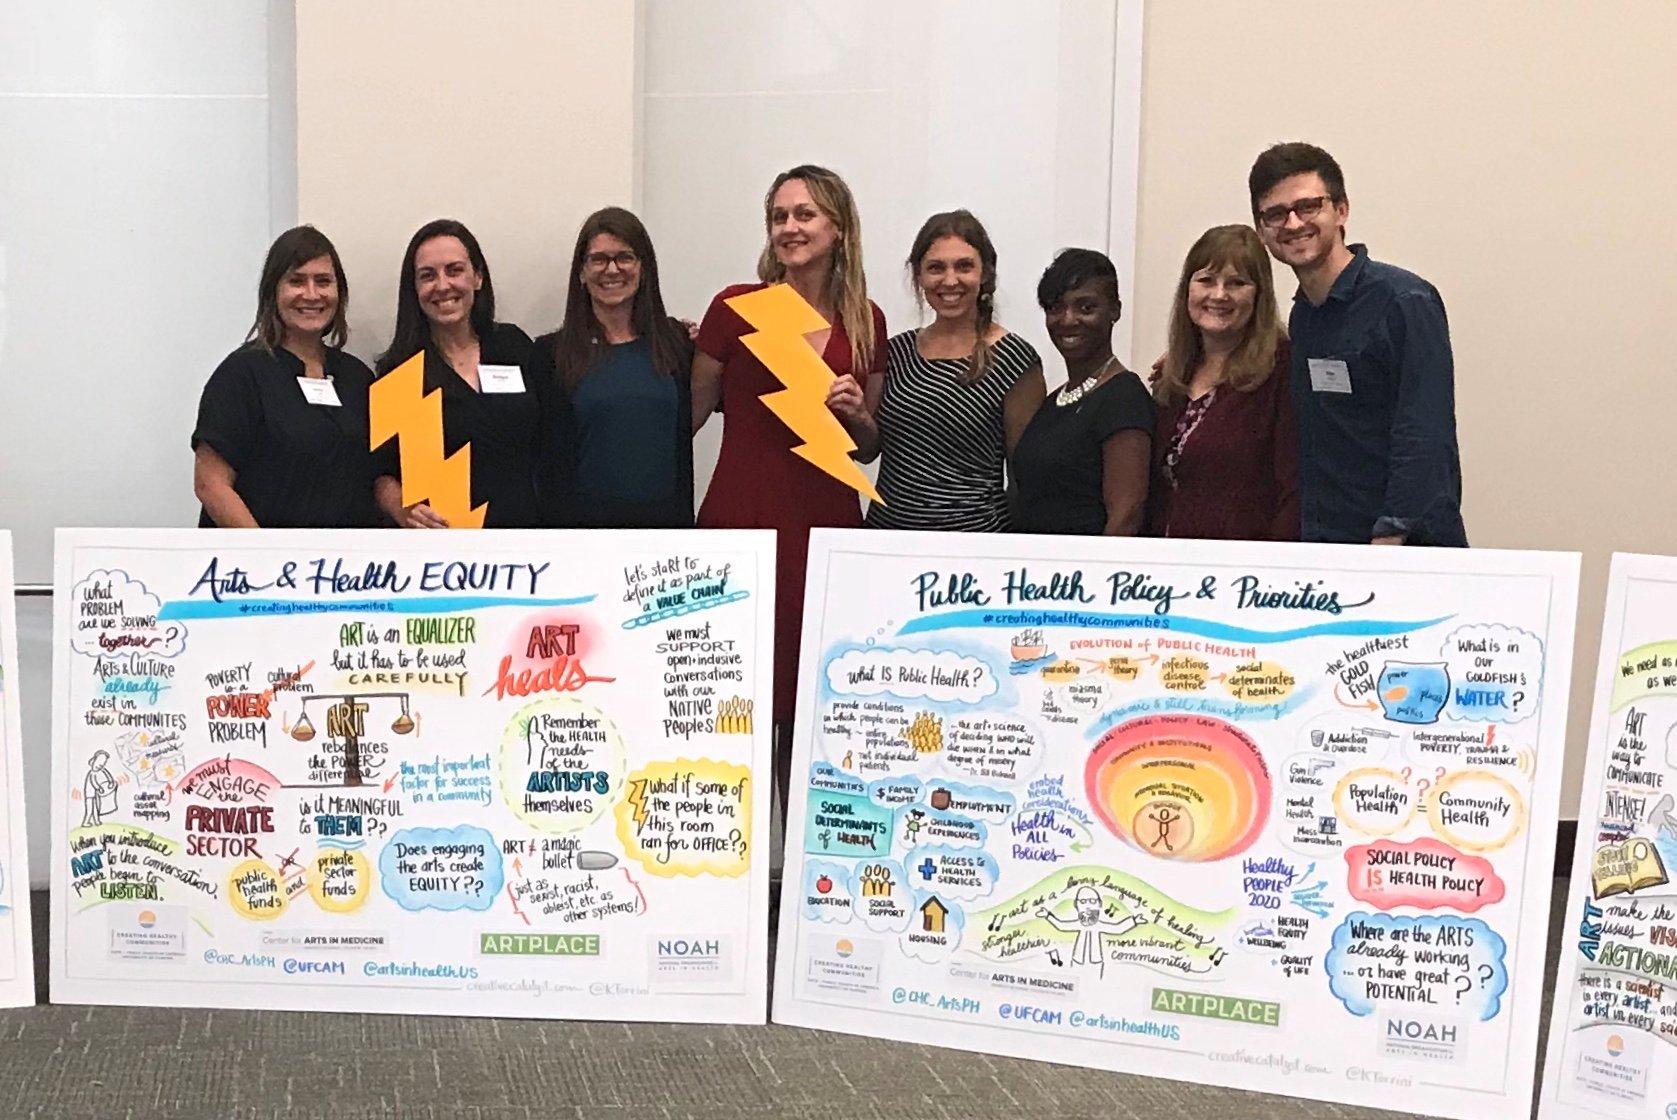 Creating Healthy Communities team